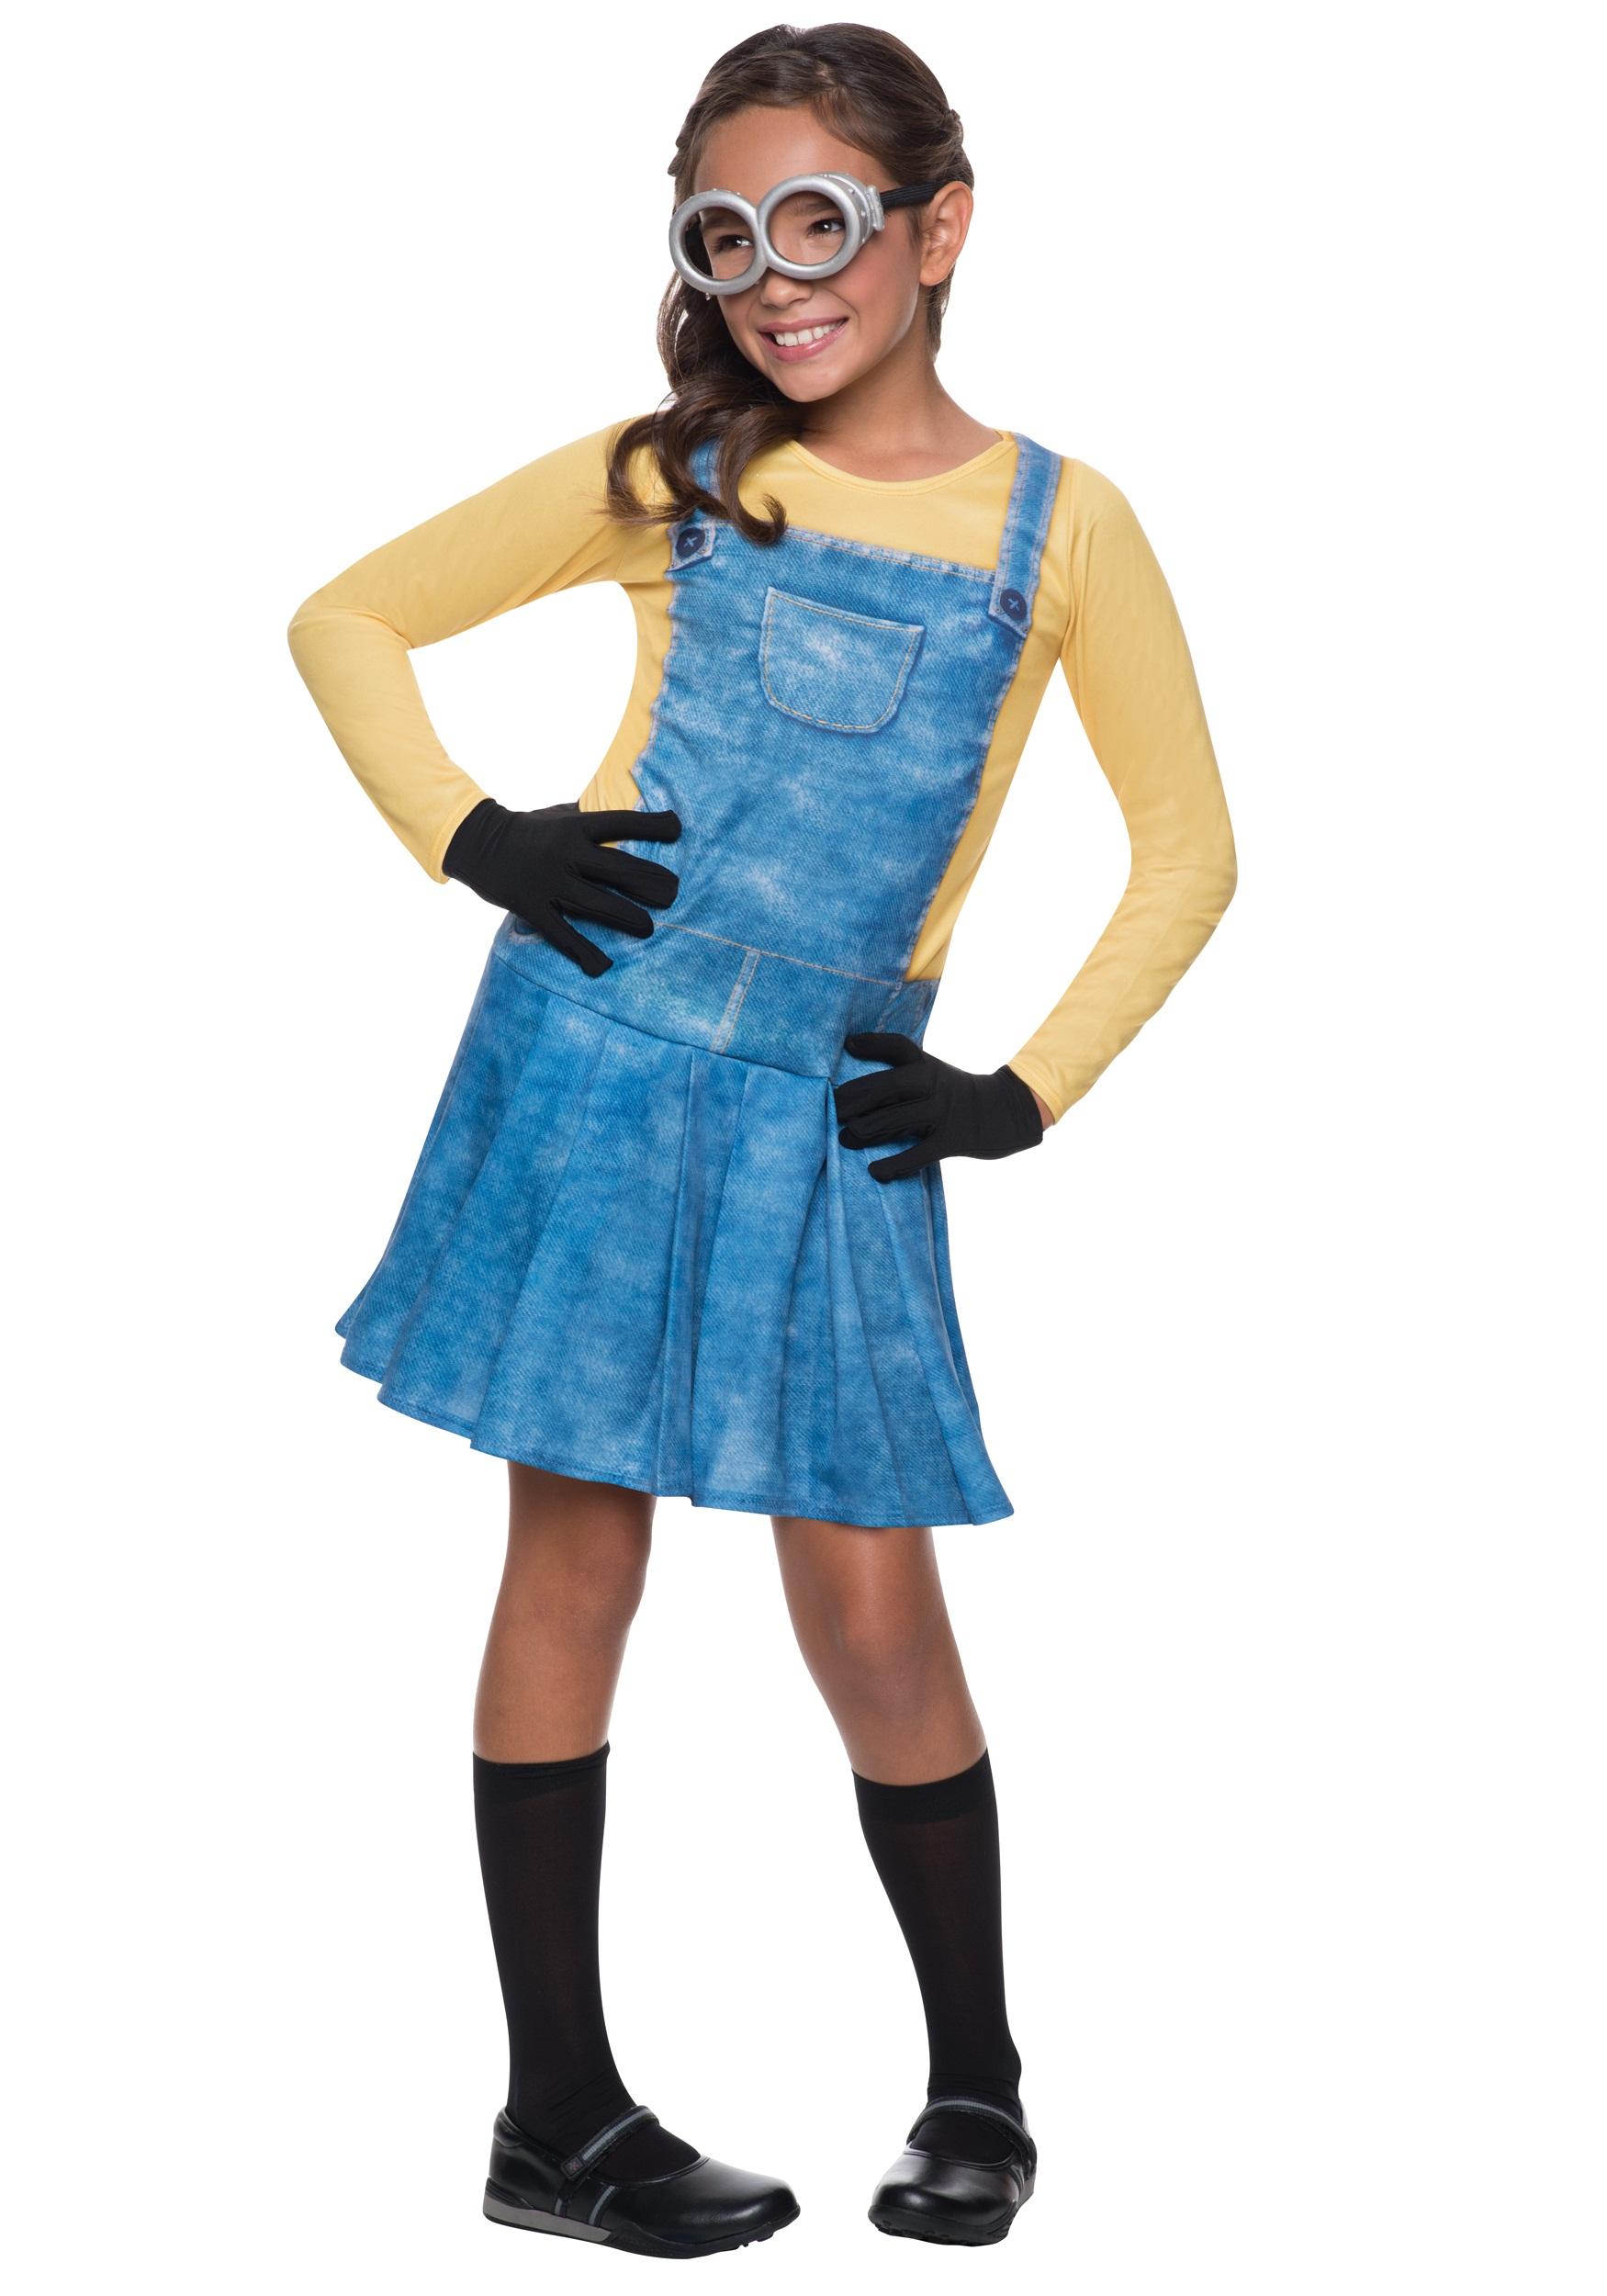 Cowboys Costumes For Females Child Female Minion Costume